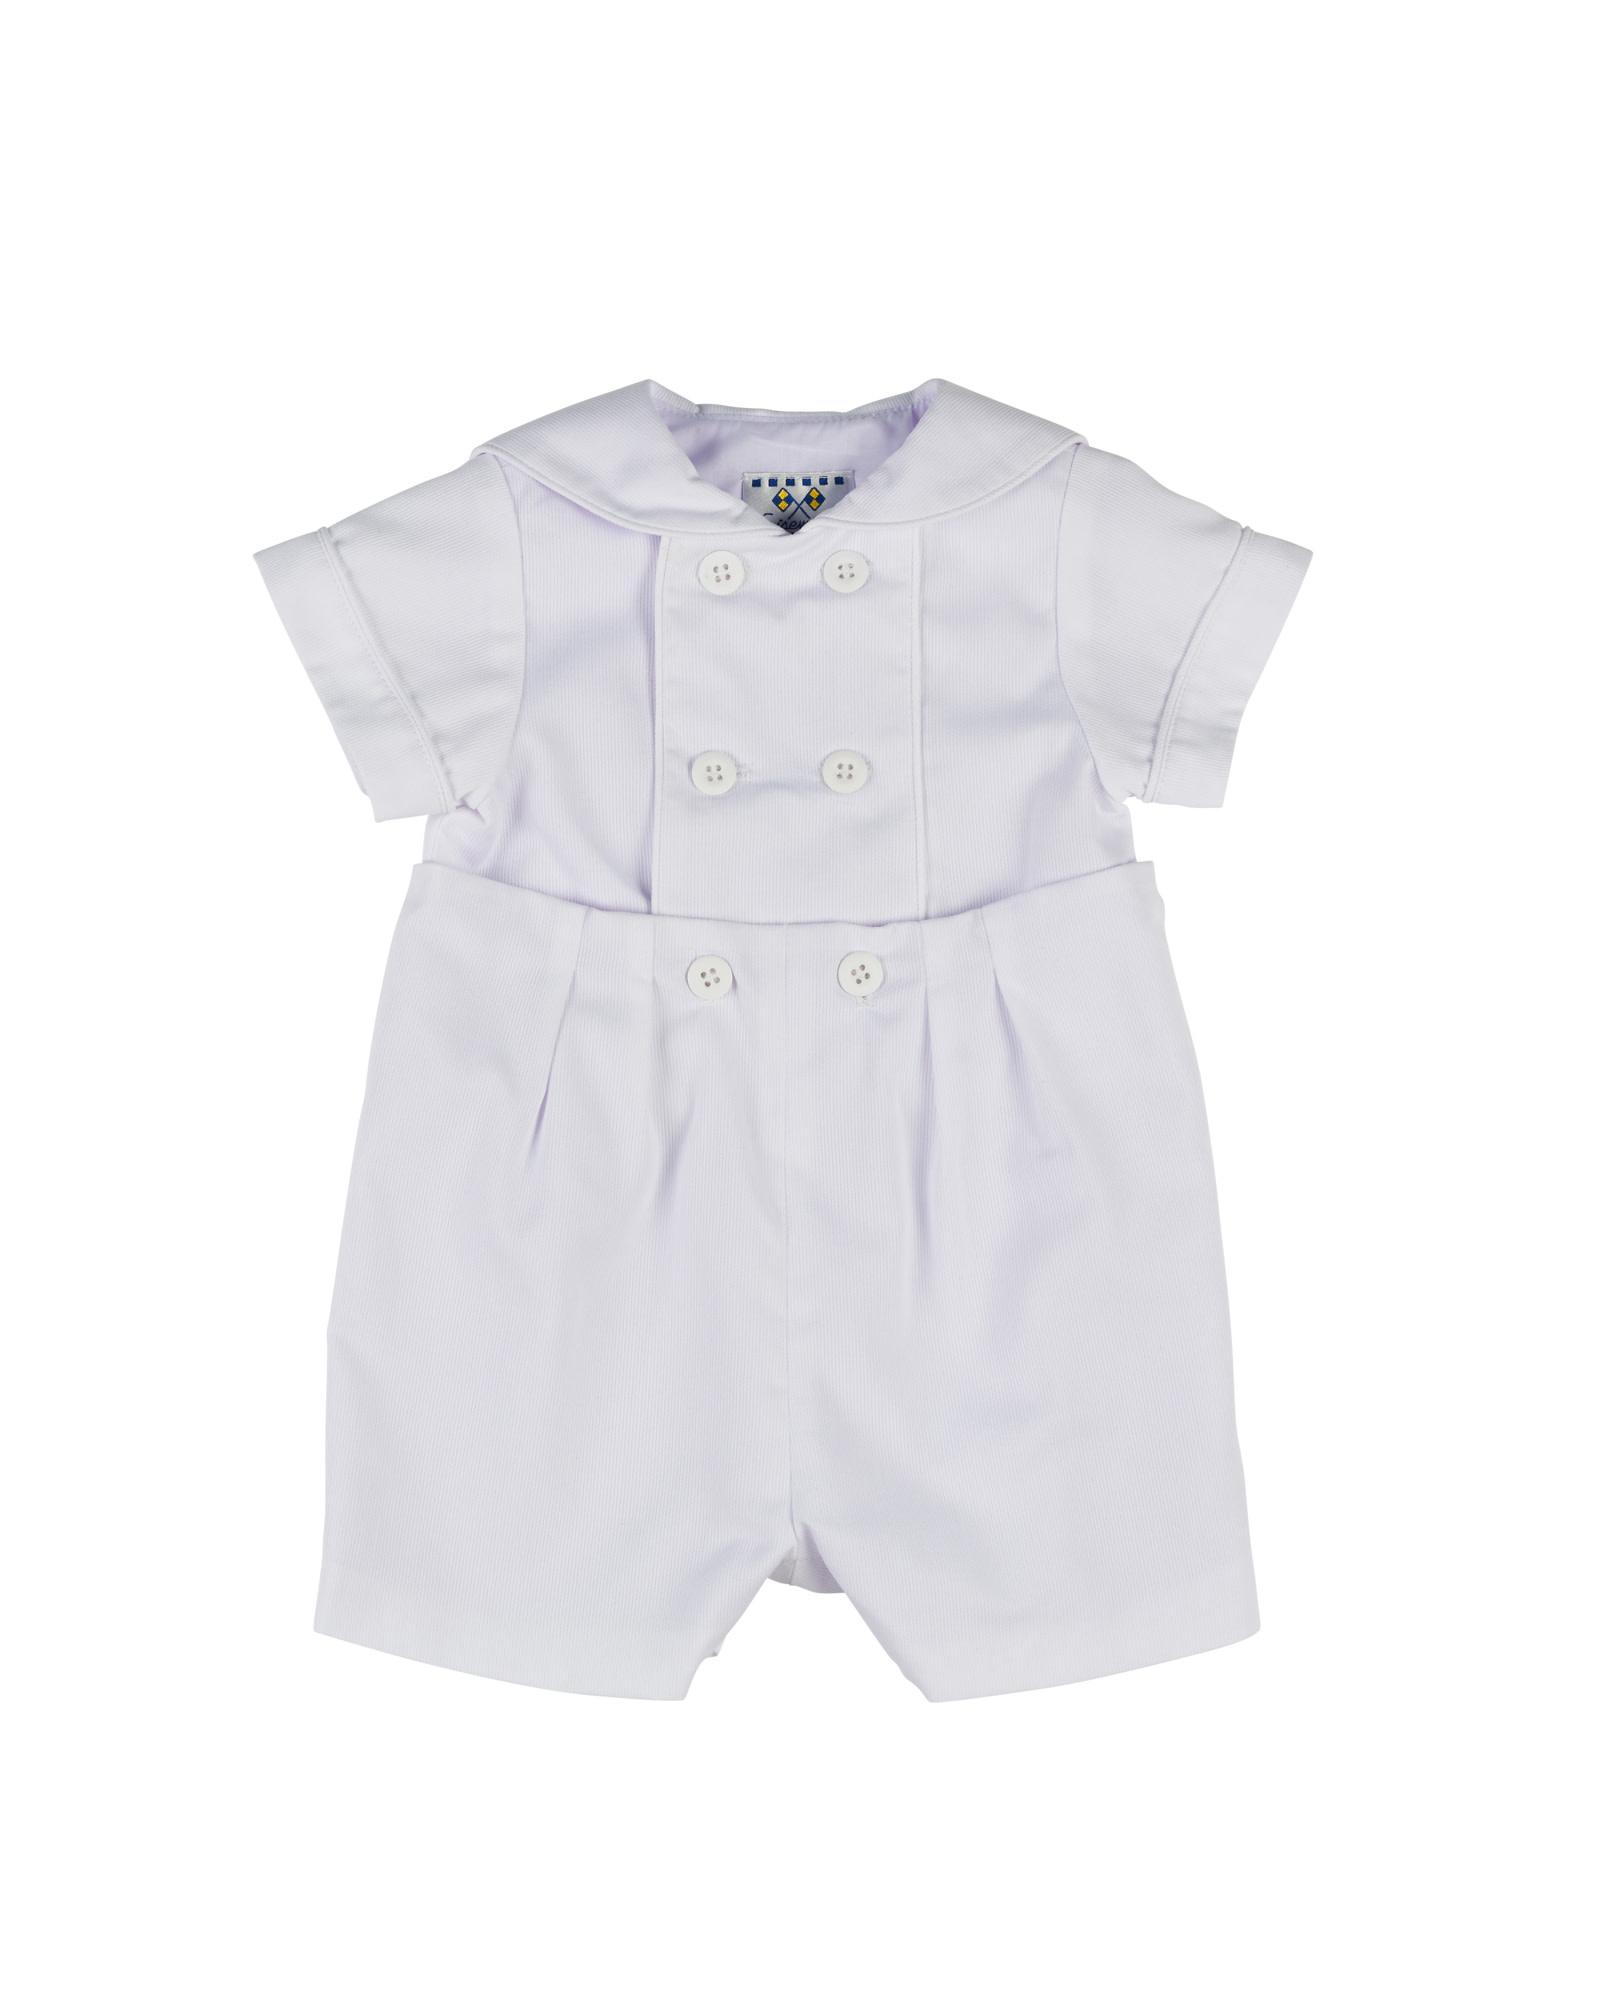 Florence Eiseman White Pique Button-On Suit